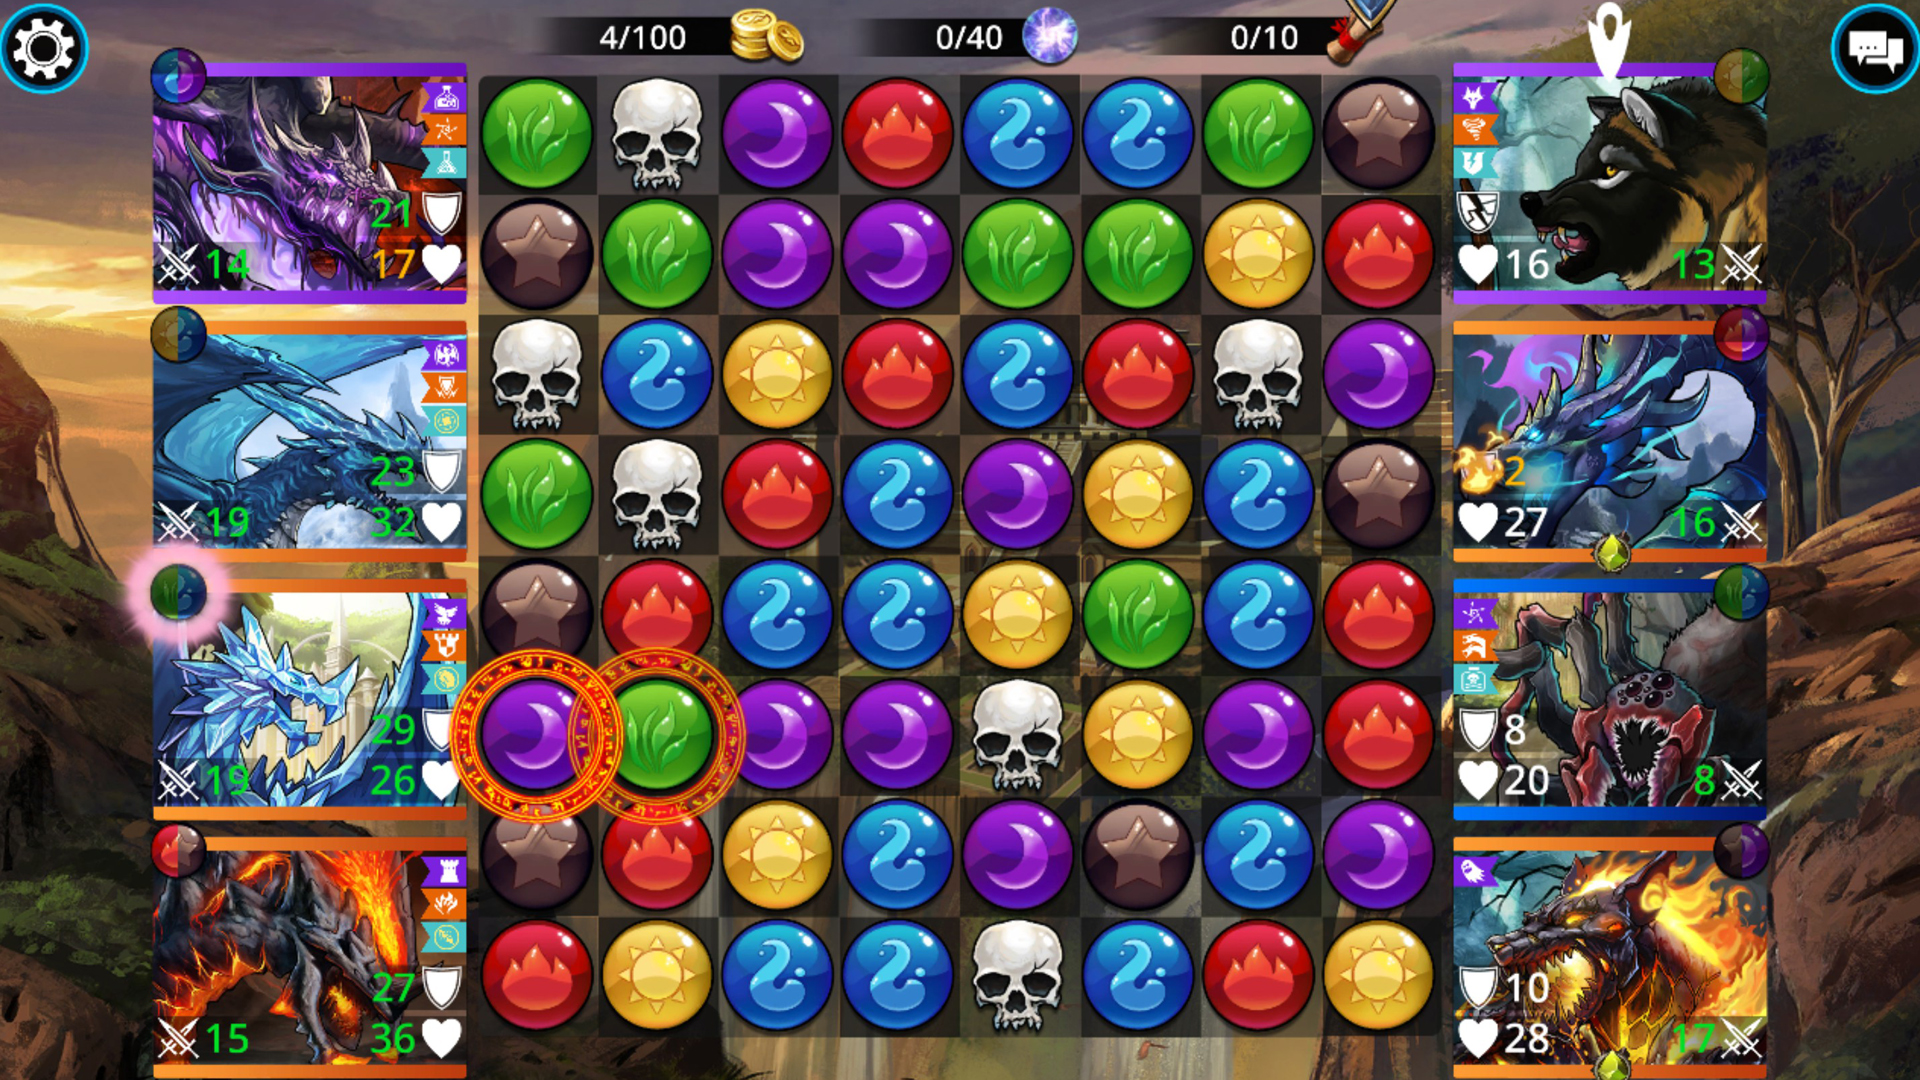 Gems of War (Free to Play) Ss_2b447ff1a667146fdc89e041145a2b34f540794f.1920x1080